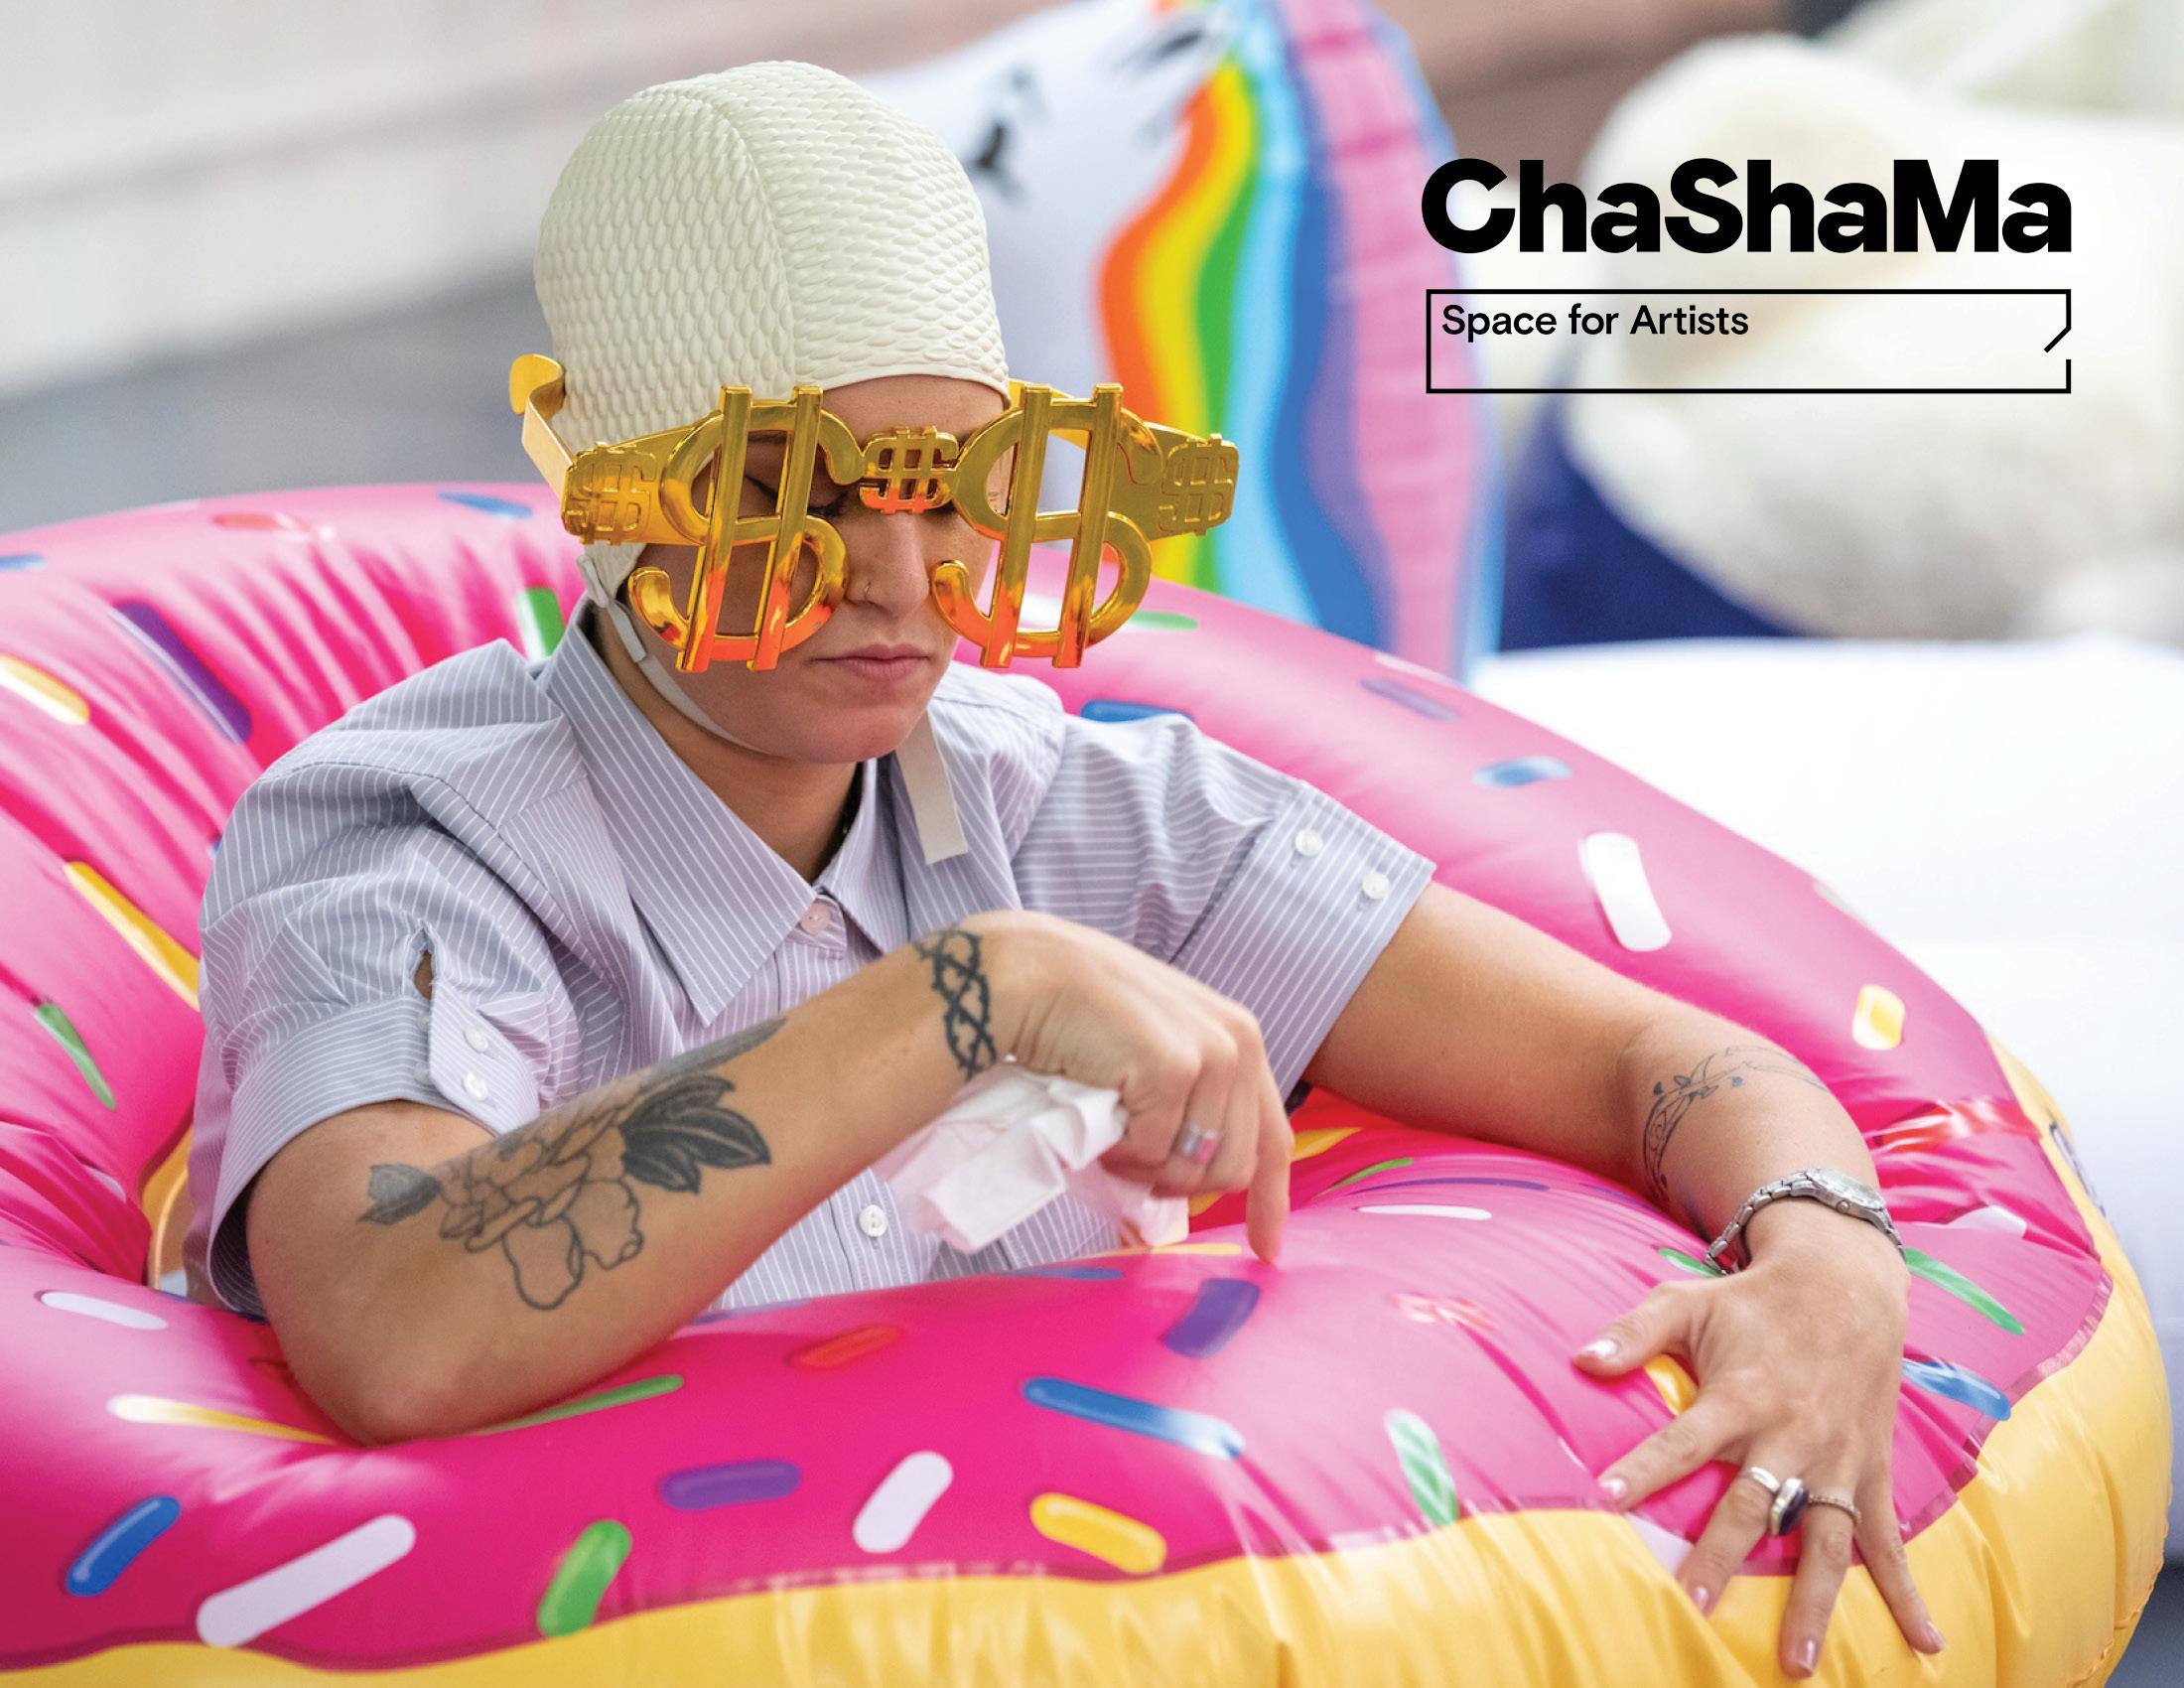 Chashama In One